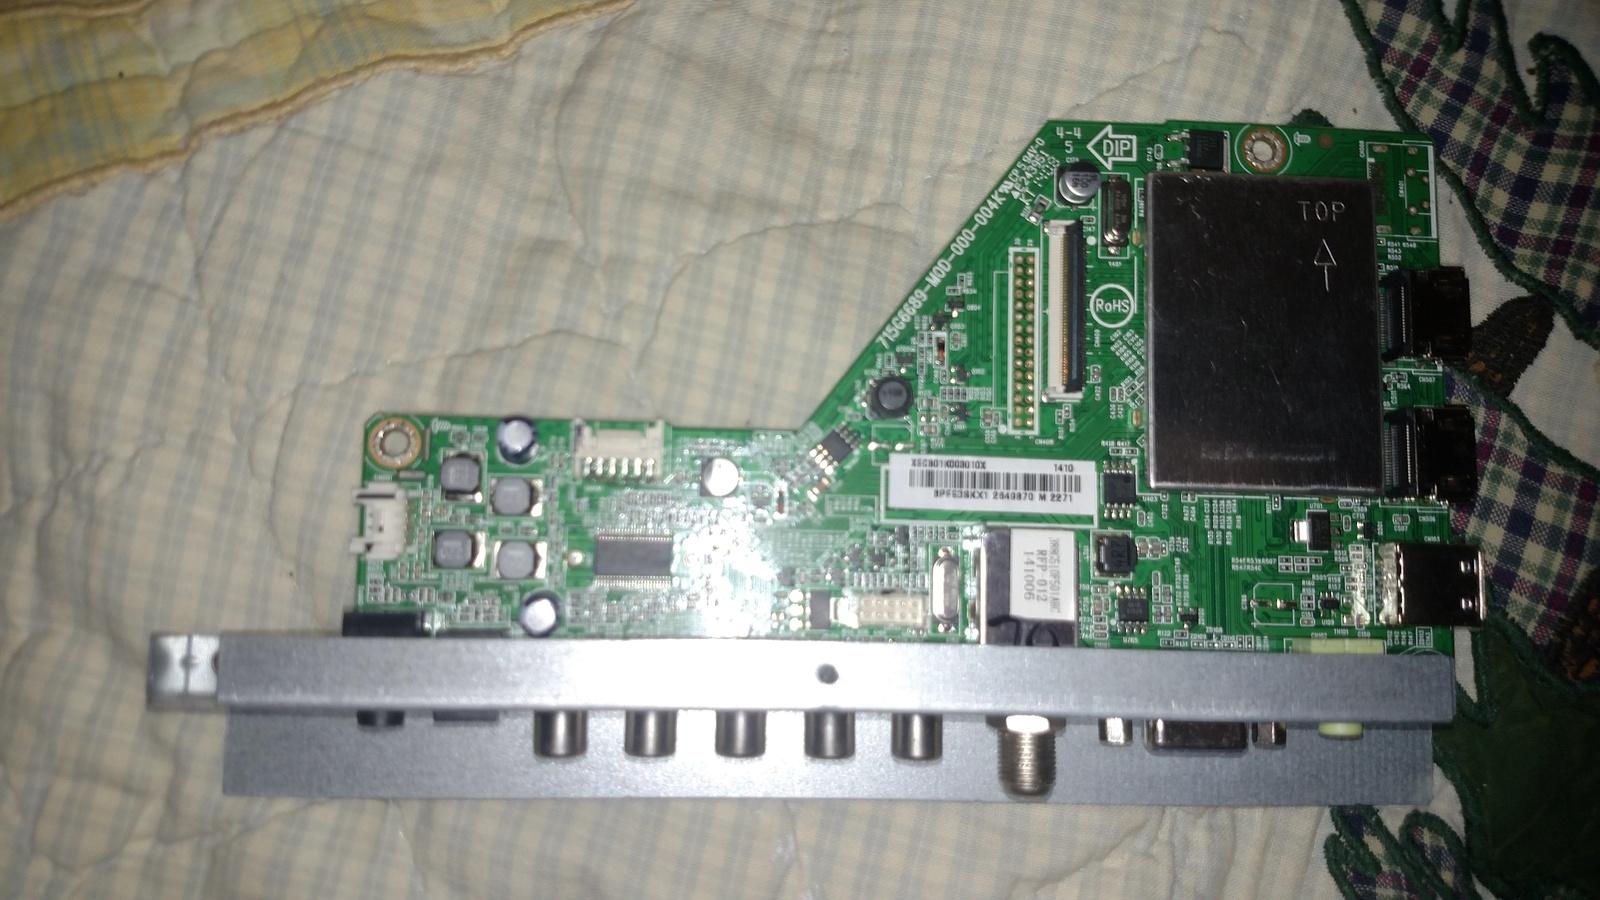 Insignia 756TXECB01K003 Main Board for NS-40D510NA15 (REV. A) - $34.99